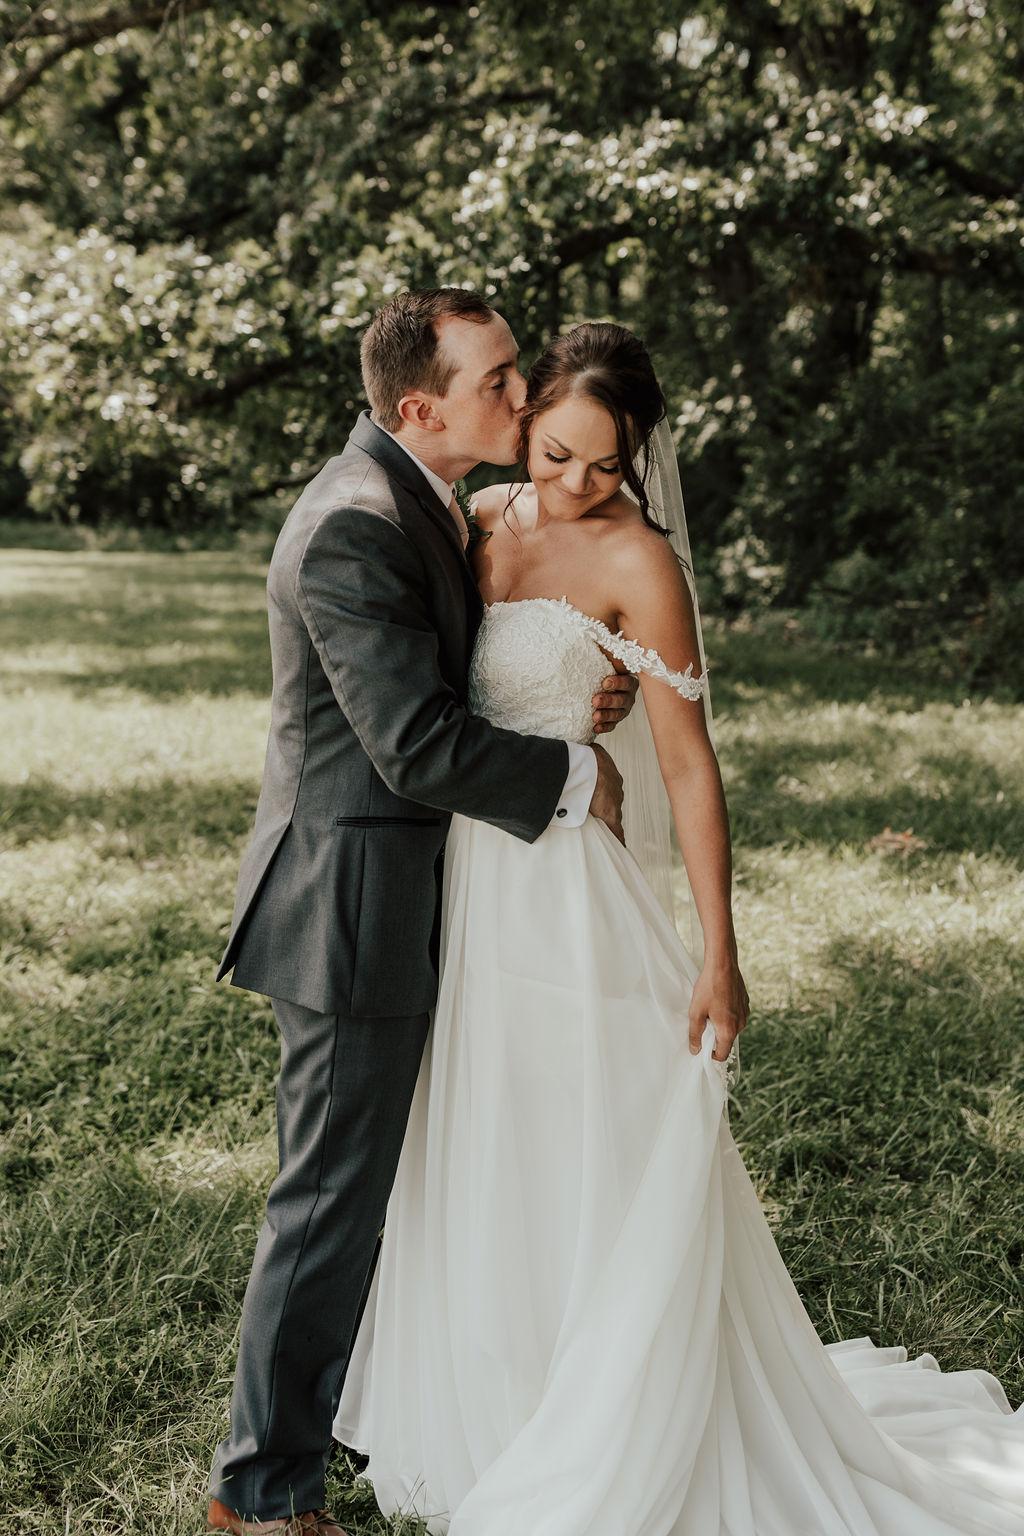 StLouis-Wedding-Photographer-Taylor+Michael-Portraits121.jpg